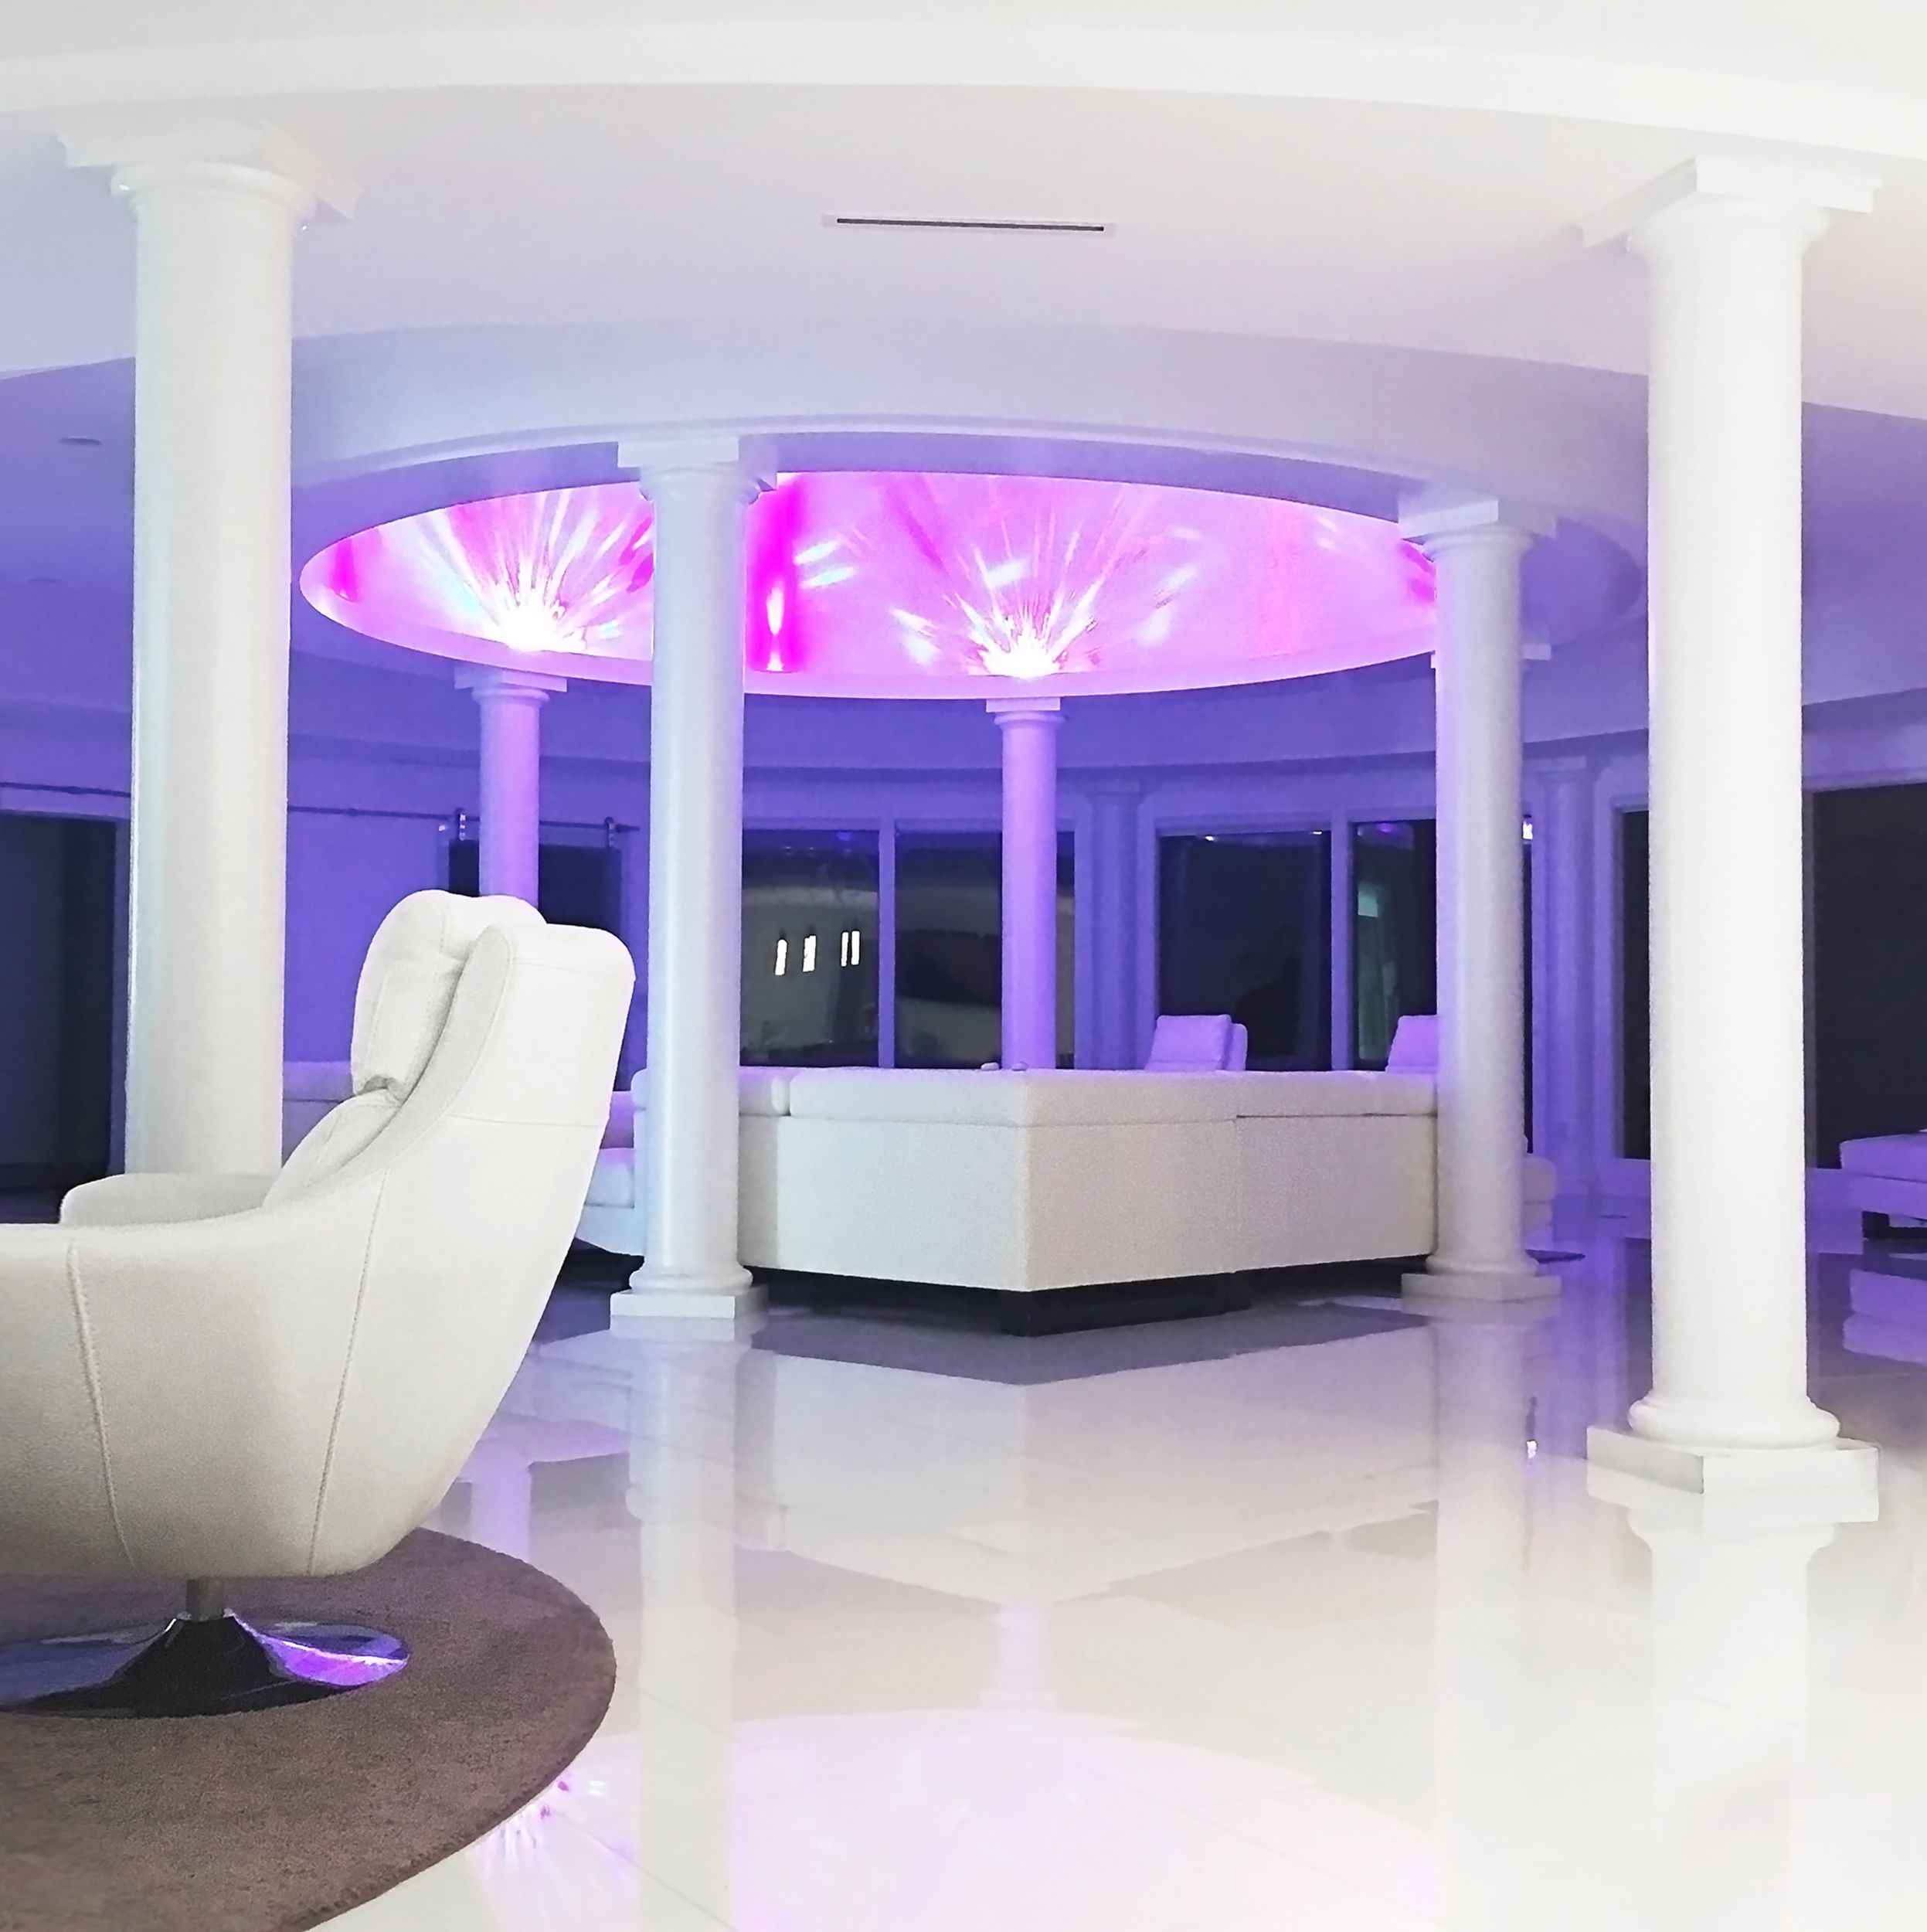 Living Room Columns endura-stone columns for living room | stone columns, columns and